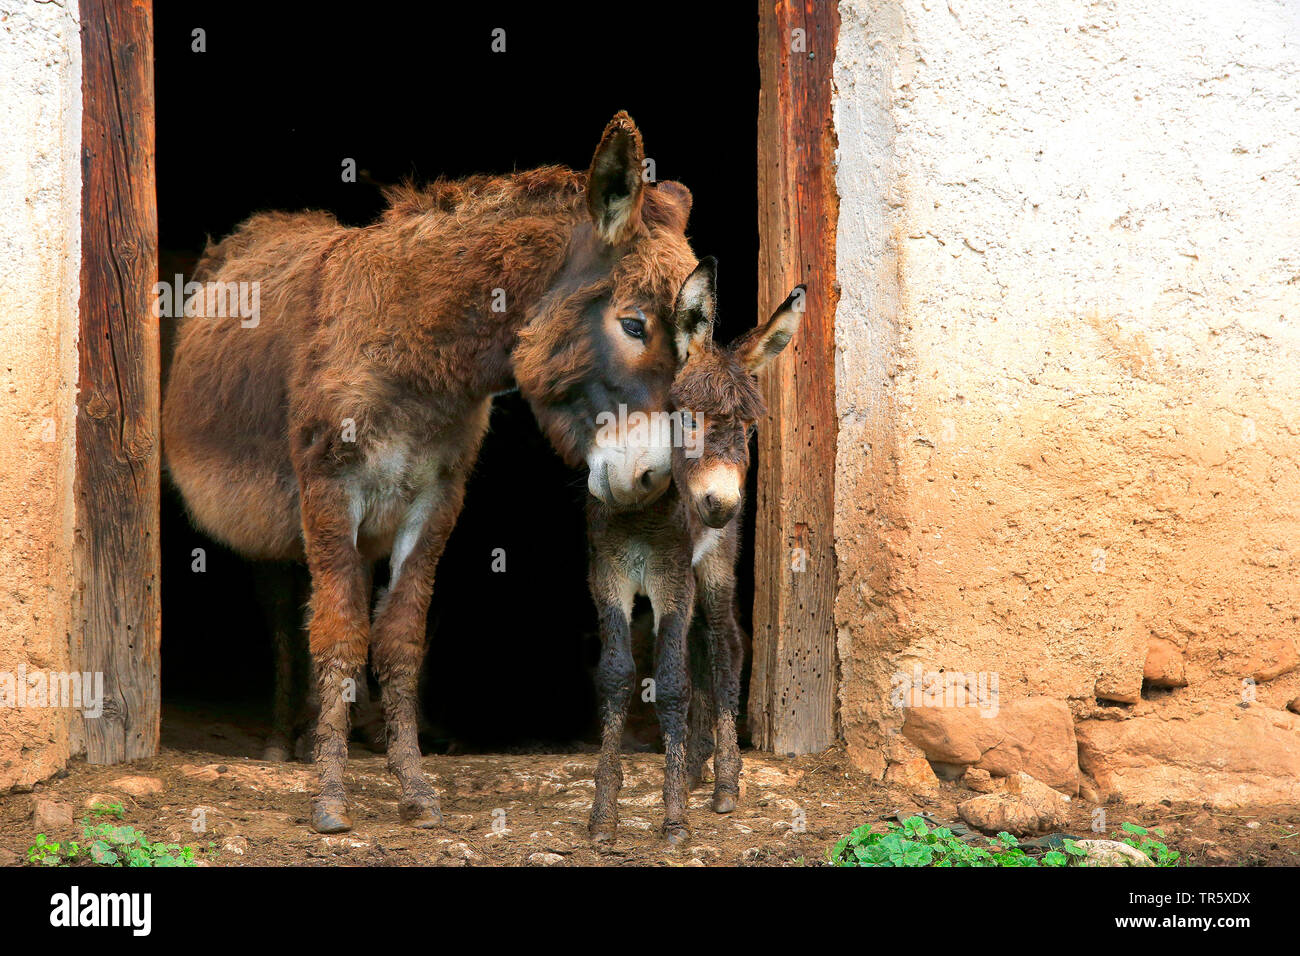 Esel, Hausesel, Haus-Esel (Equus asinus asinus), Esel mit Jungtier am Stall, Deutschland   Domestic donkey (Equus asinus asinus), adult with pup in fr - Stock Image